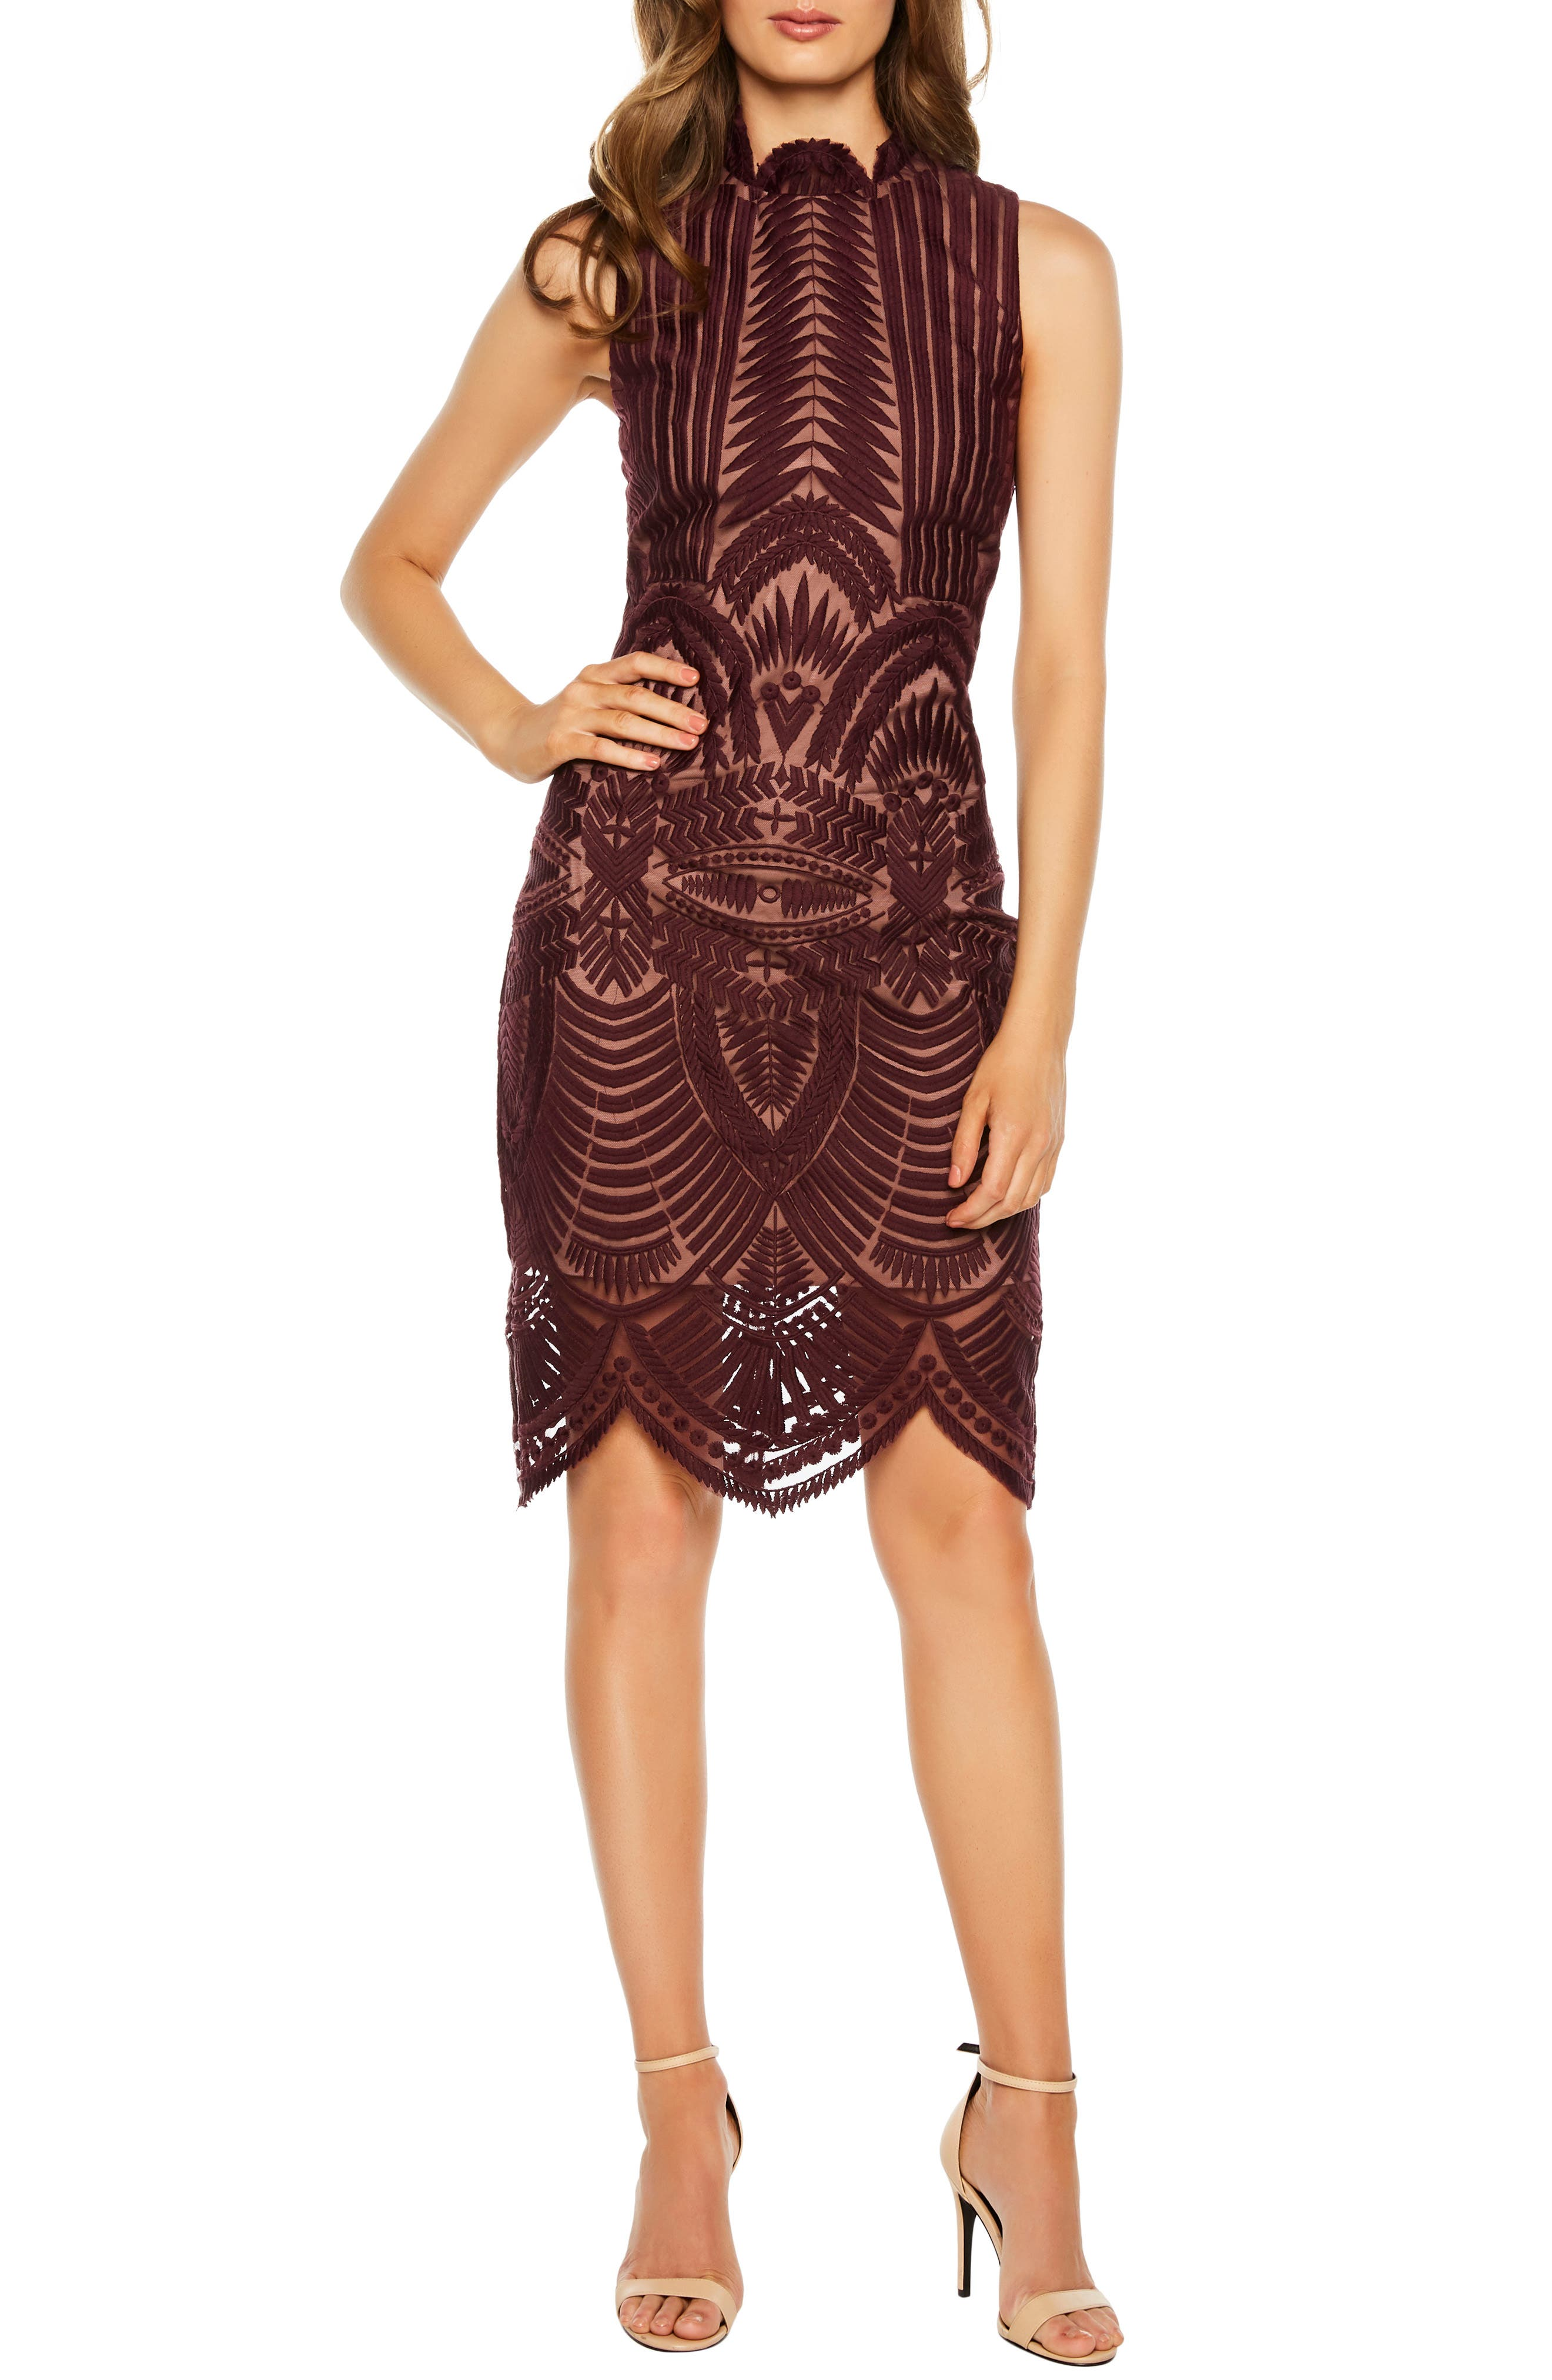 BARDOT, Alice Lace Body-Con Dress, Alternate thumbnail 6, color, 608